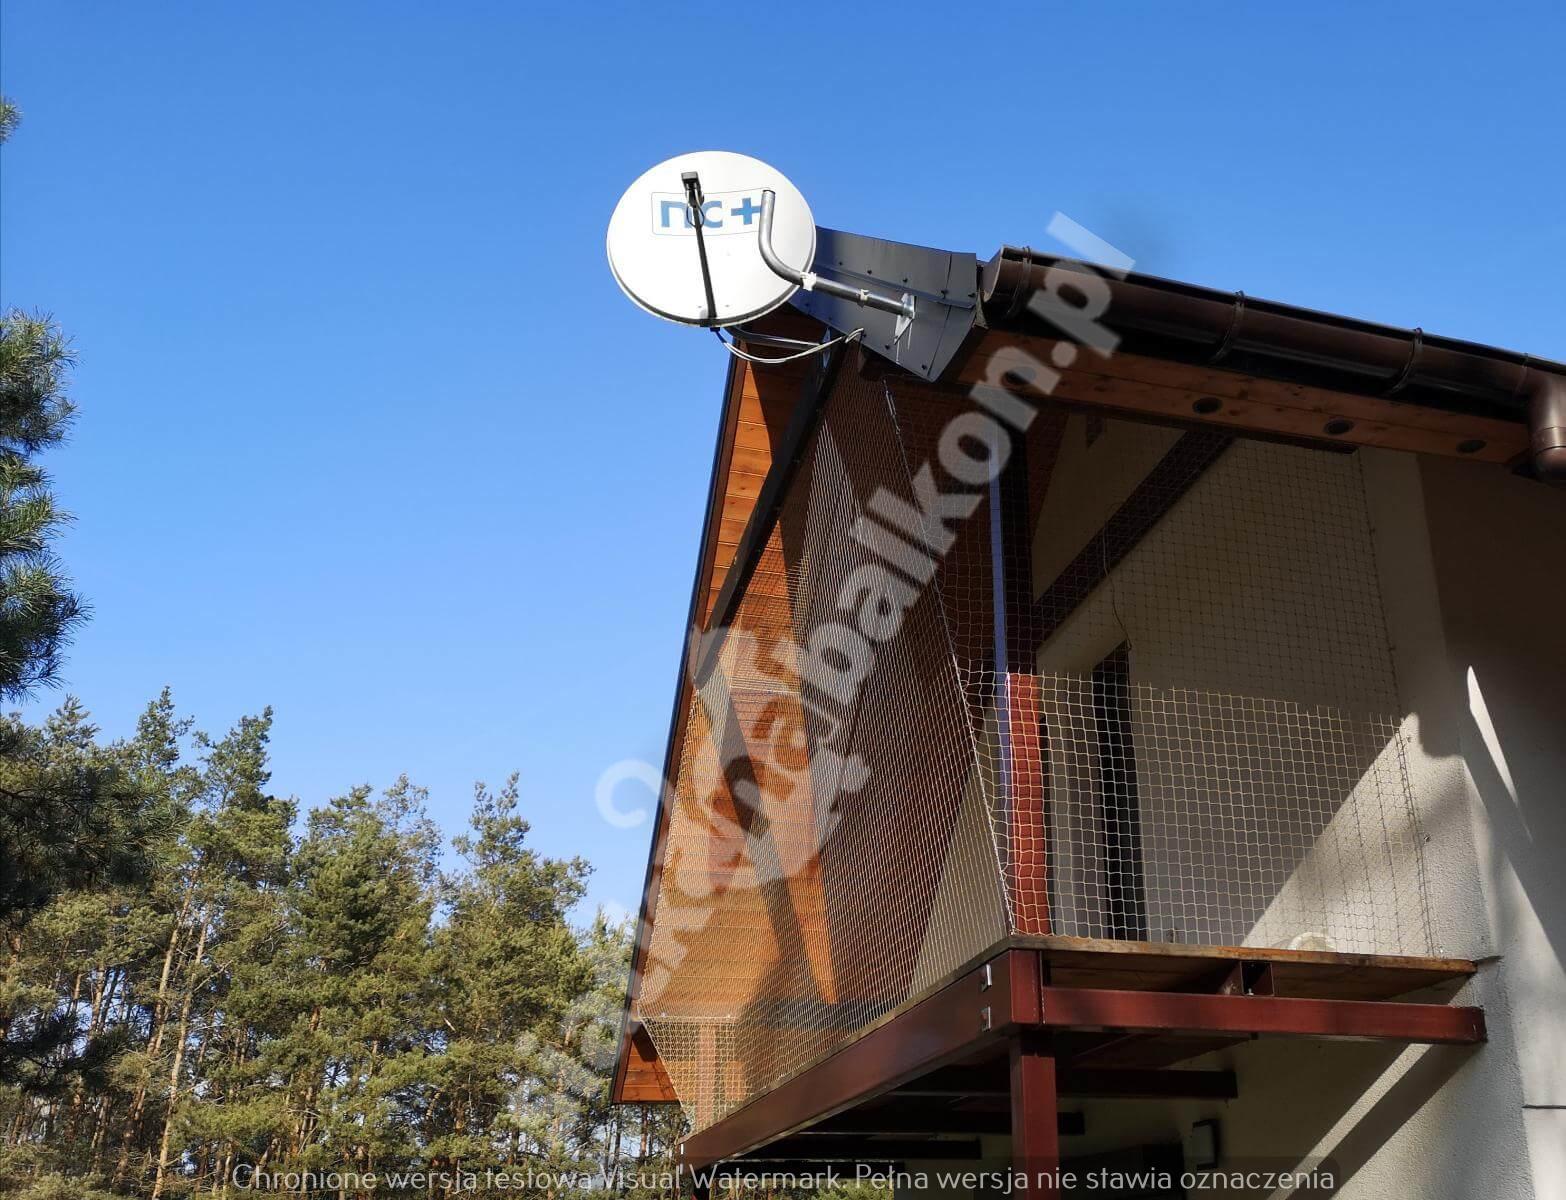 satka-na-balkon-nietypowy-ksztalt (1)